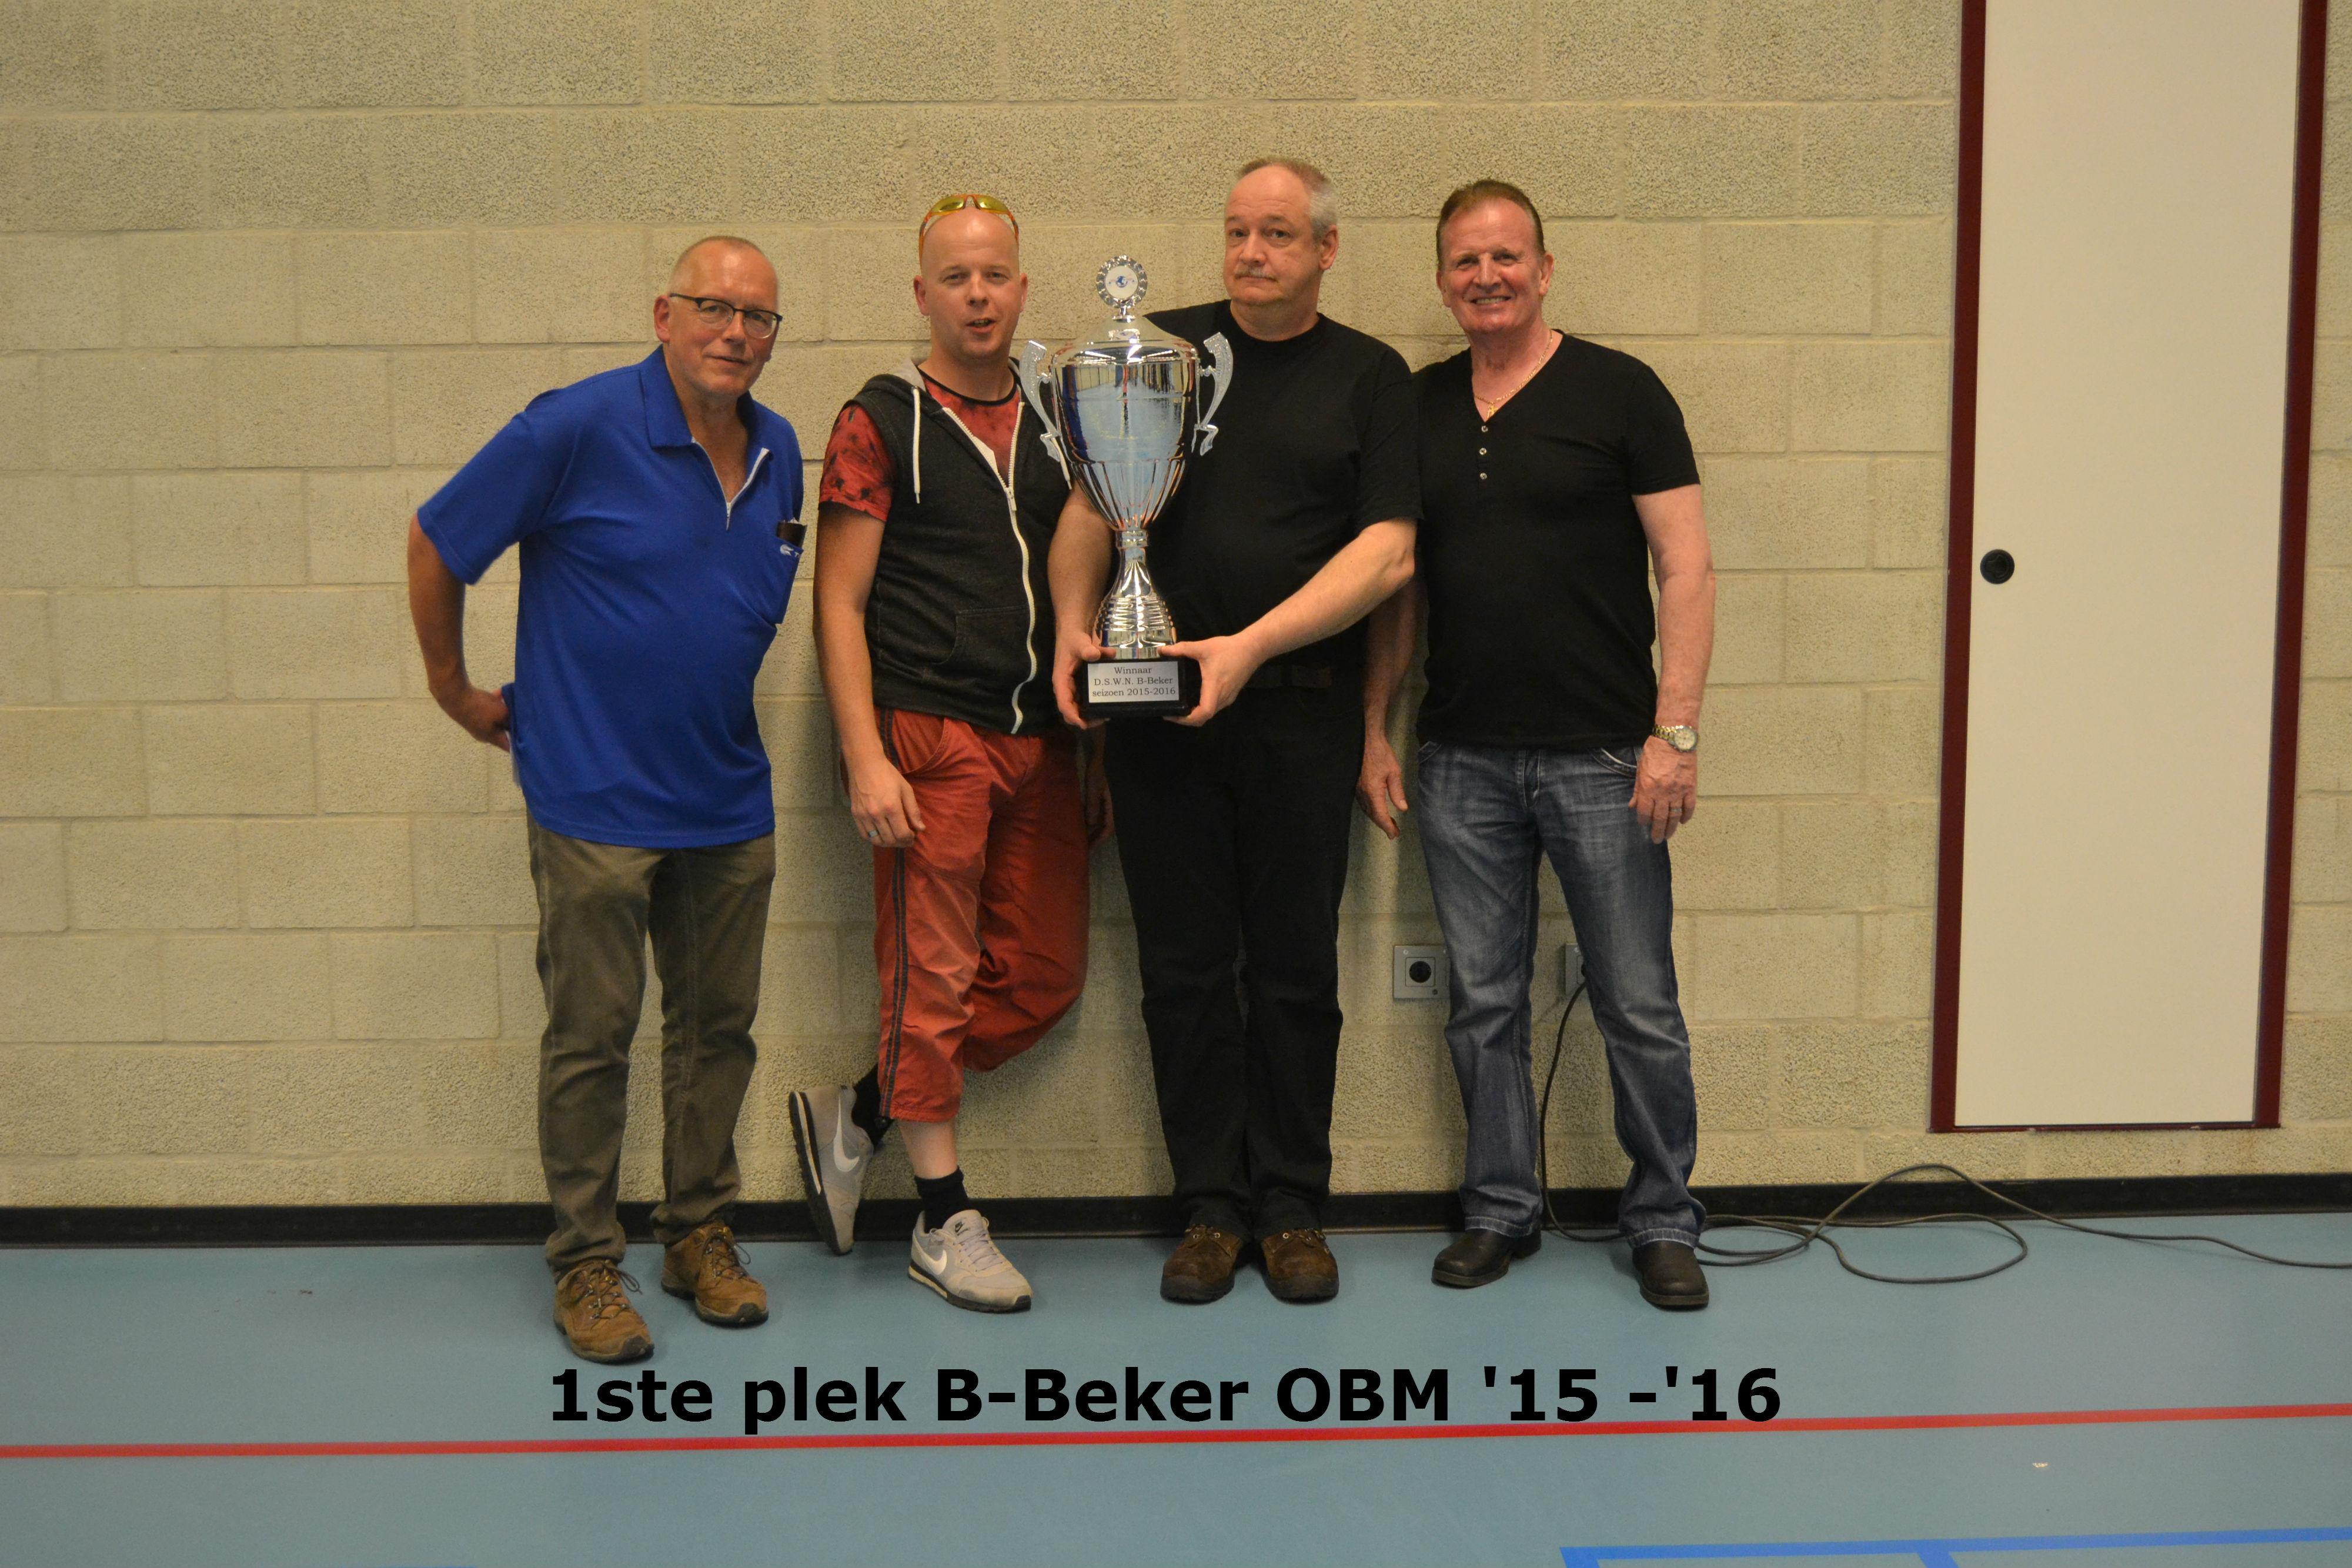 1ste plek B-Beker OBM